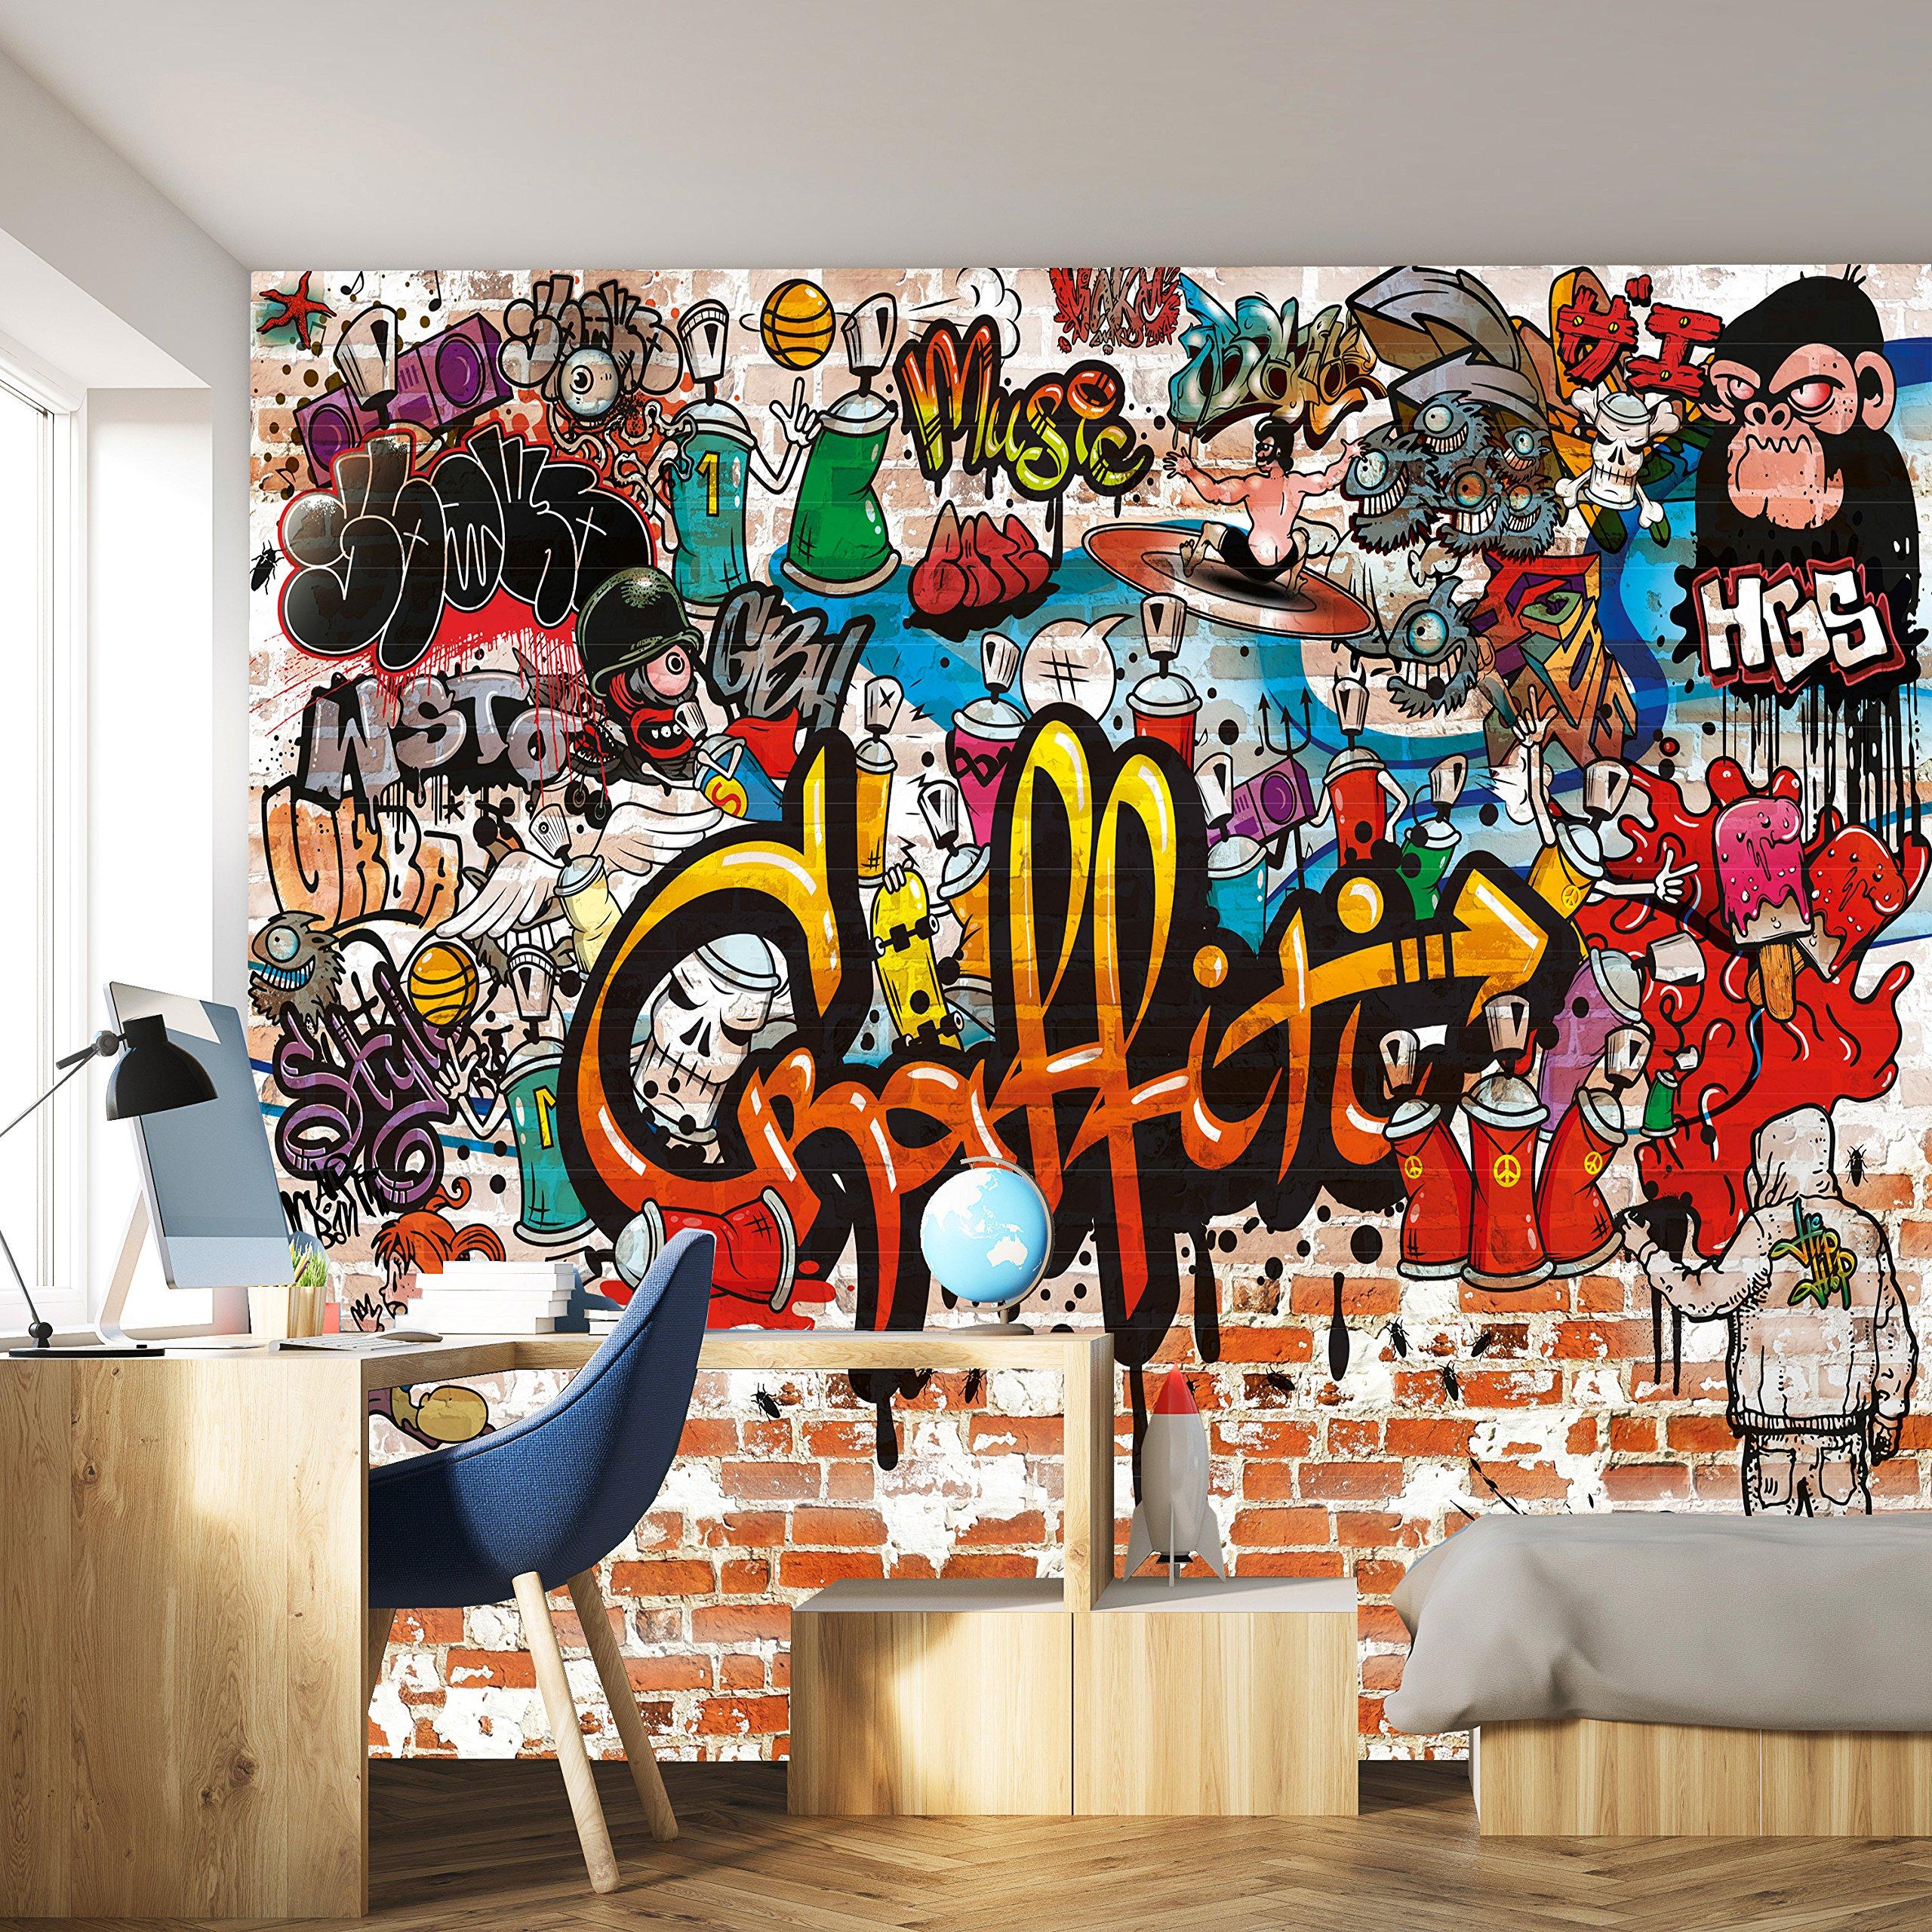 graffiti wall mural amazon co ukmurimage photo wallpaper graffiti 366 x 254 cm wall mural grafitti bricks vintage urban children kids